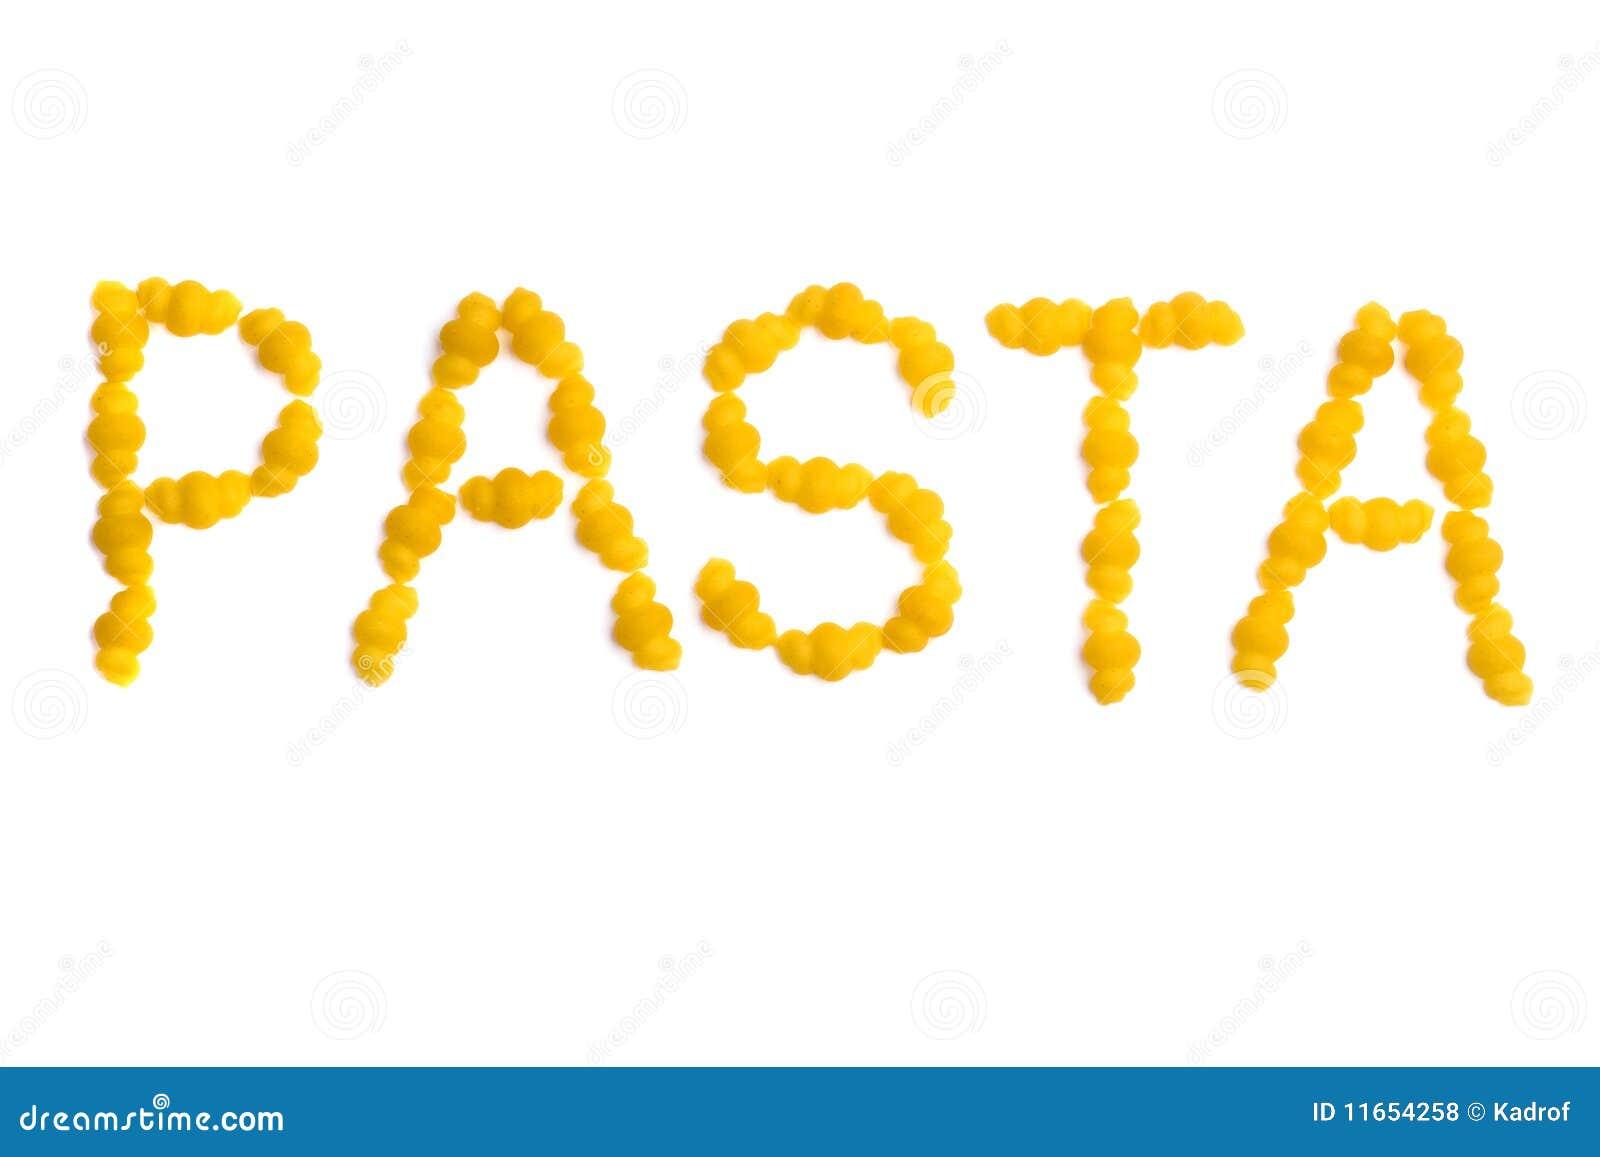 Pasta Word Royalty Free Stock Photos Image 11654258